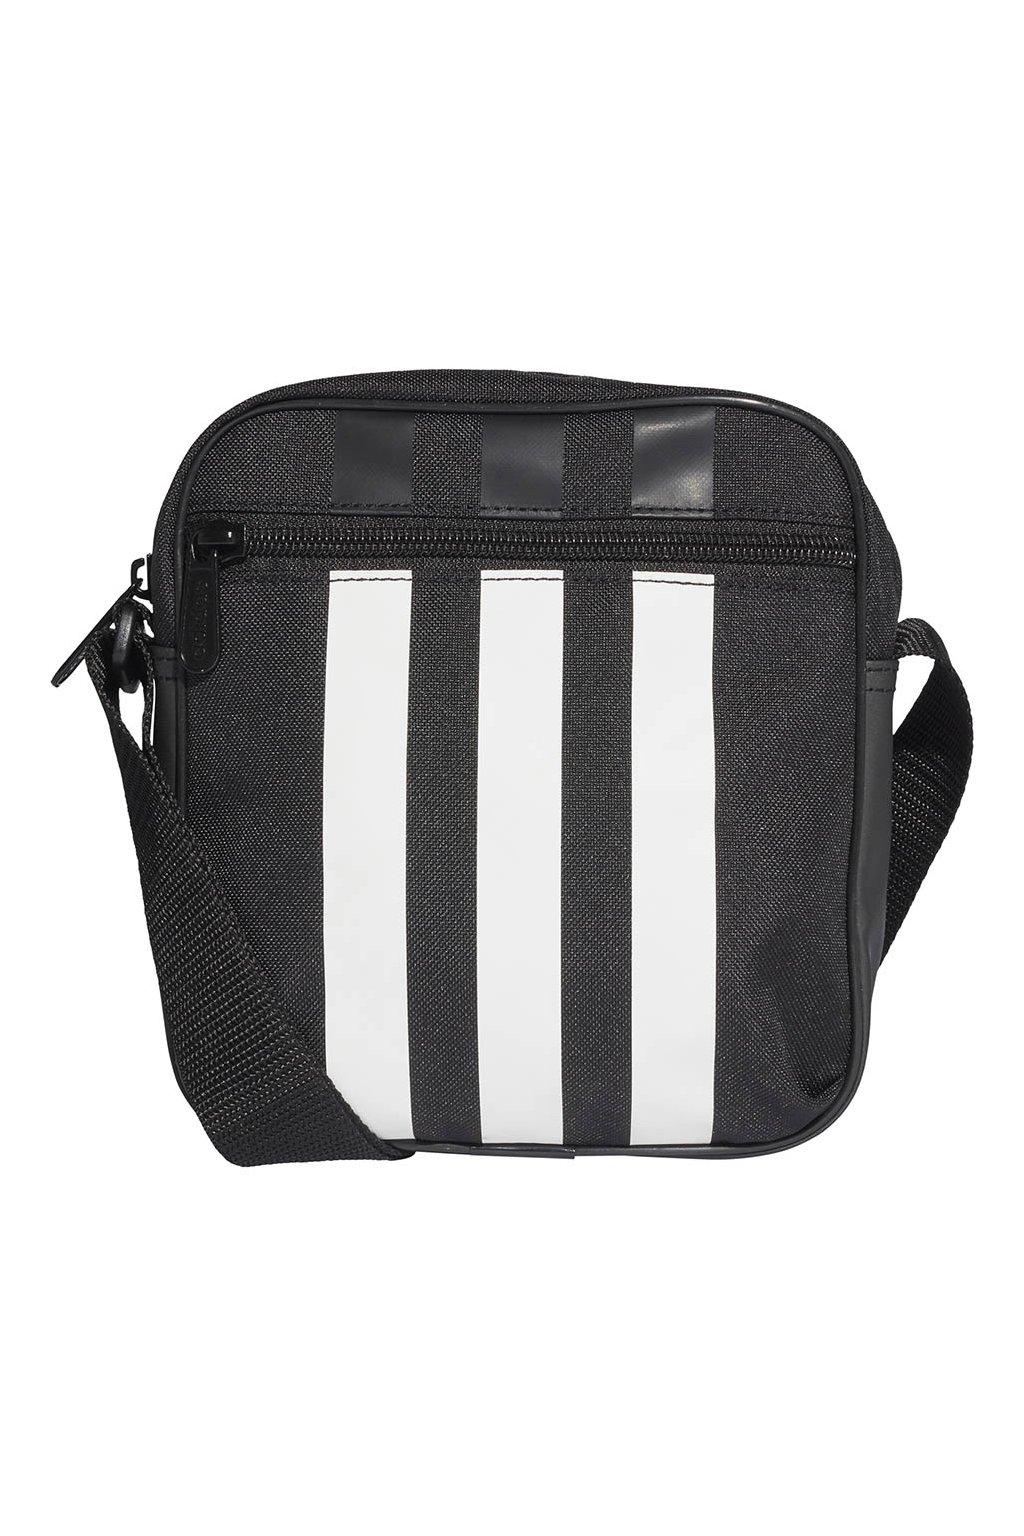 Taška Adidas 3S Organizer čierna FL1750